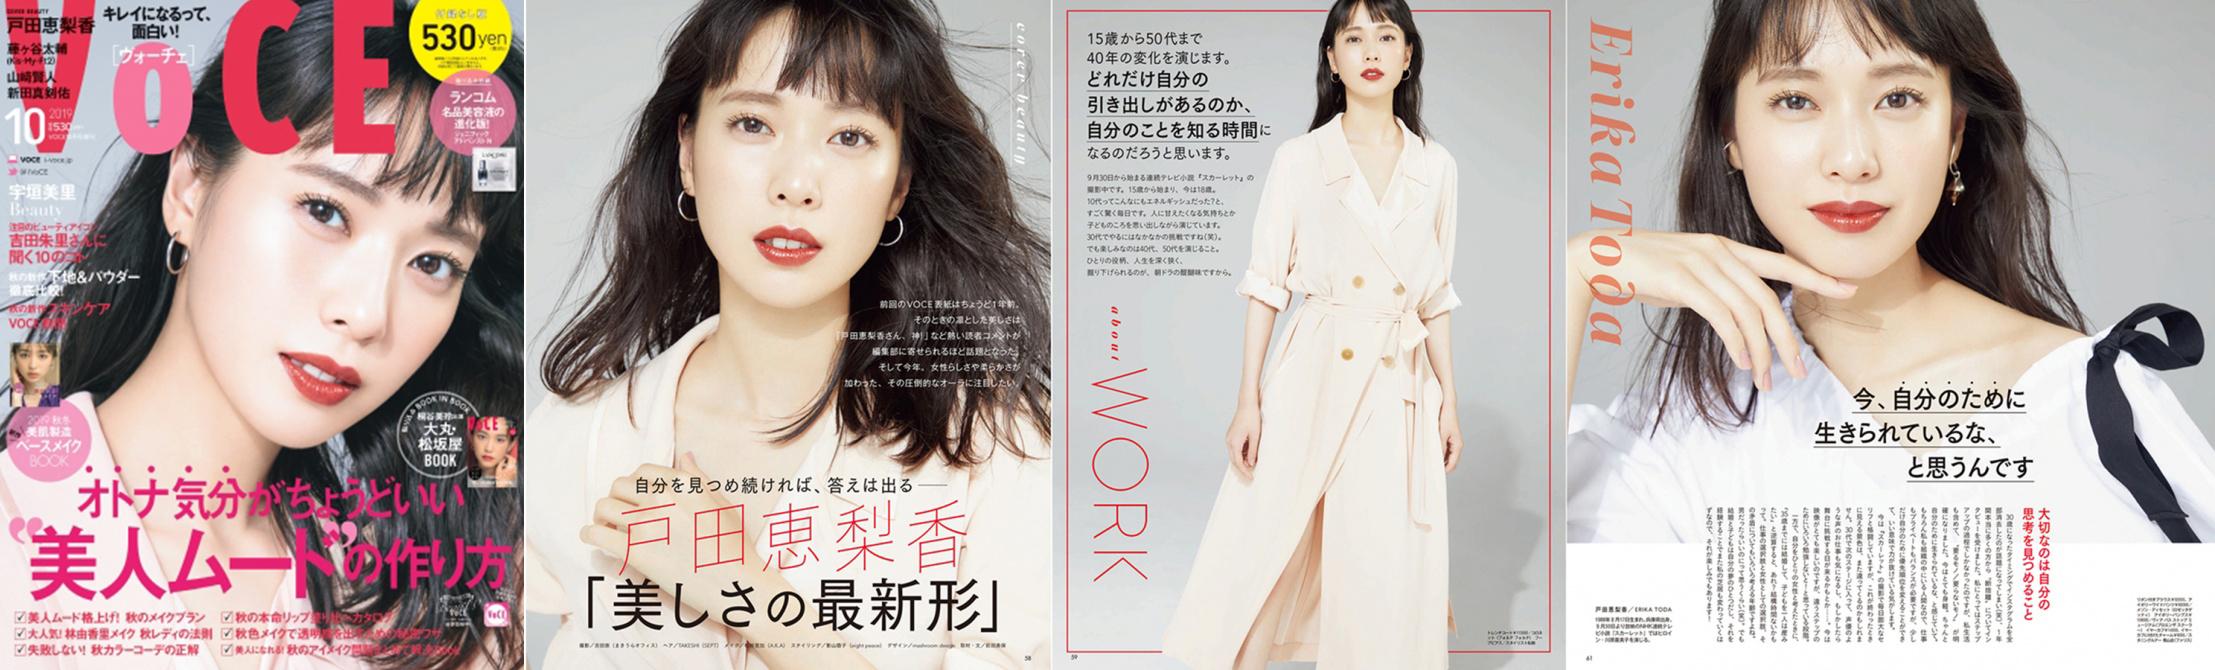 VOCE 2019 10月号 / Cove